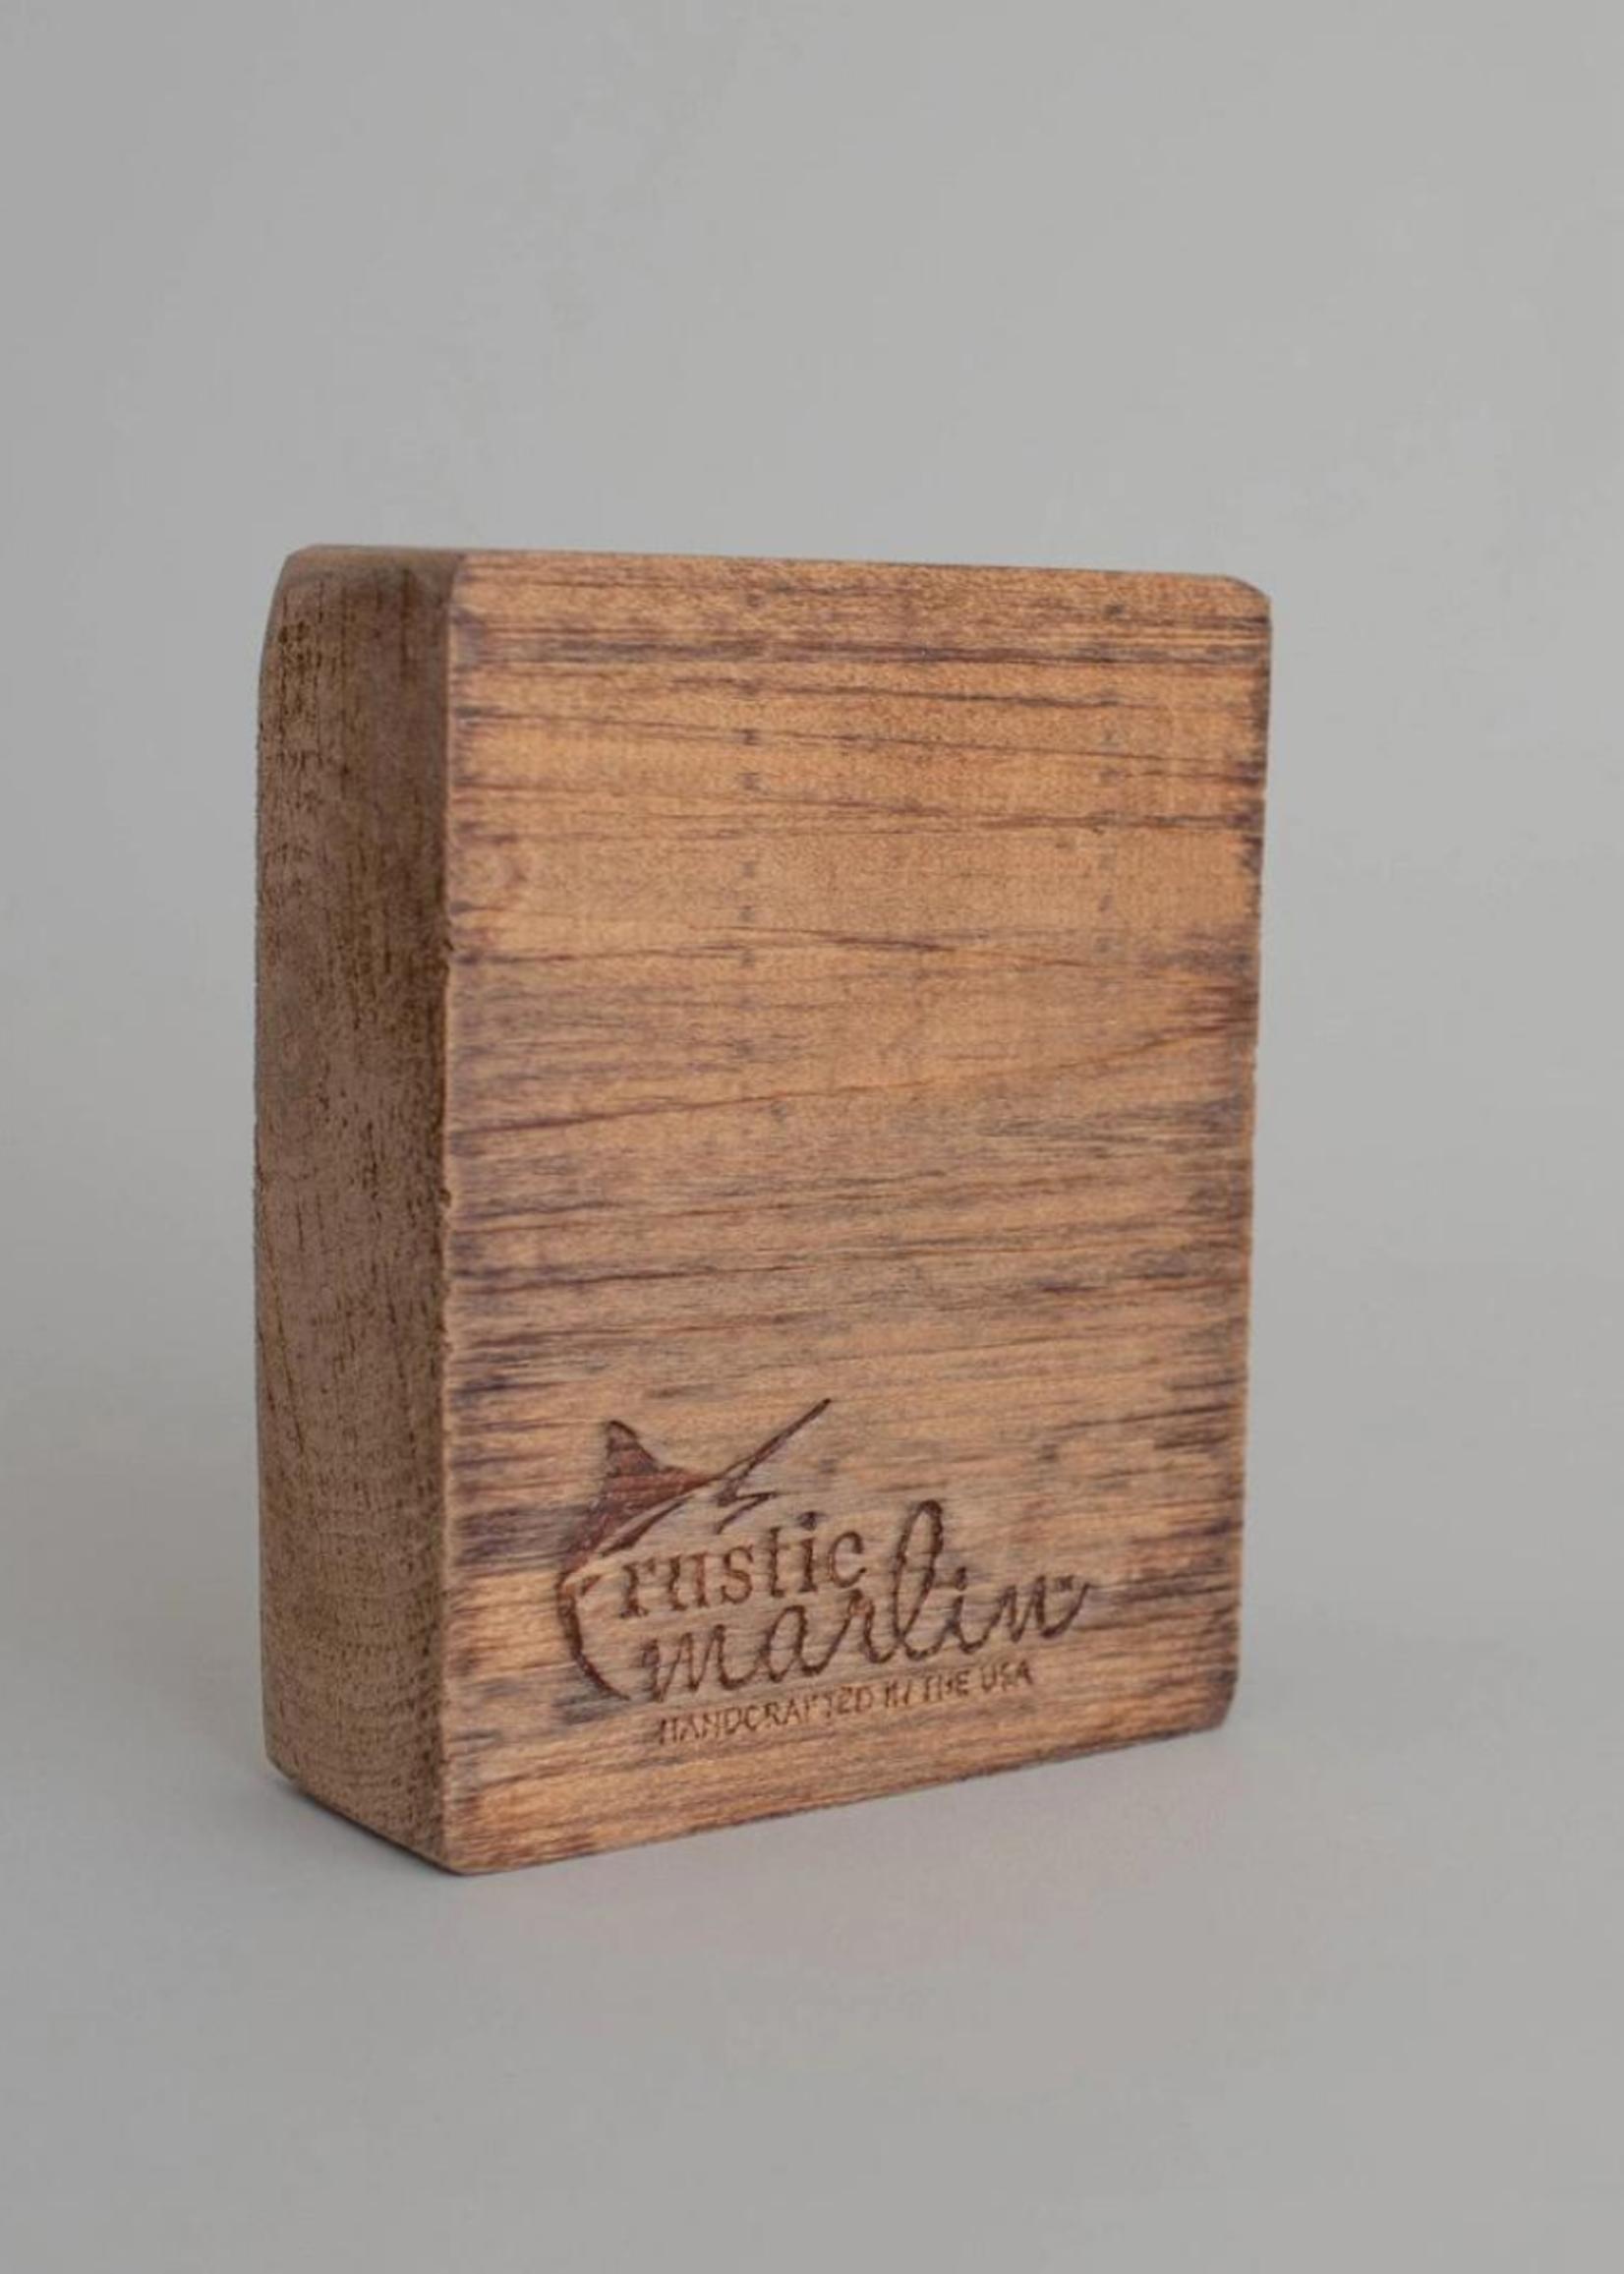 Rustic Marlin Grey Plaid Shamrock Wooden Block